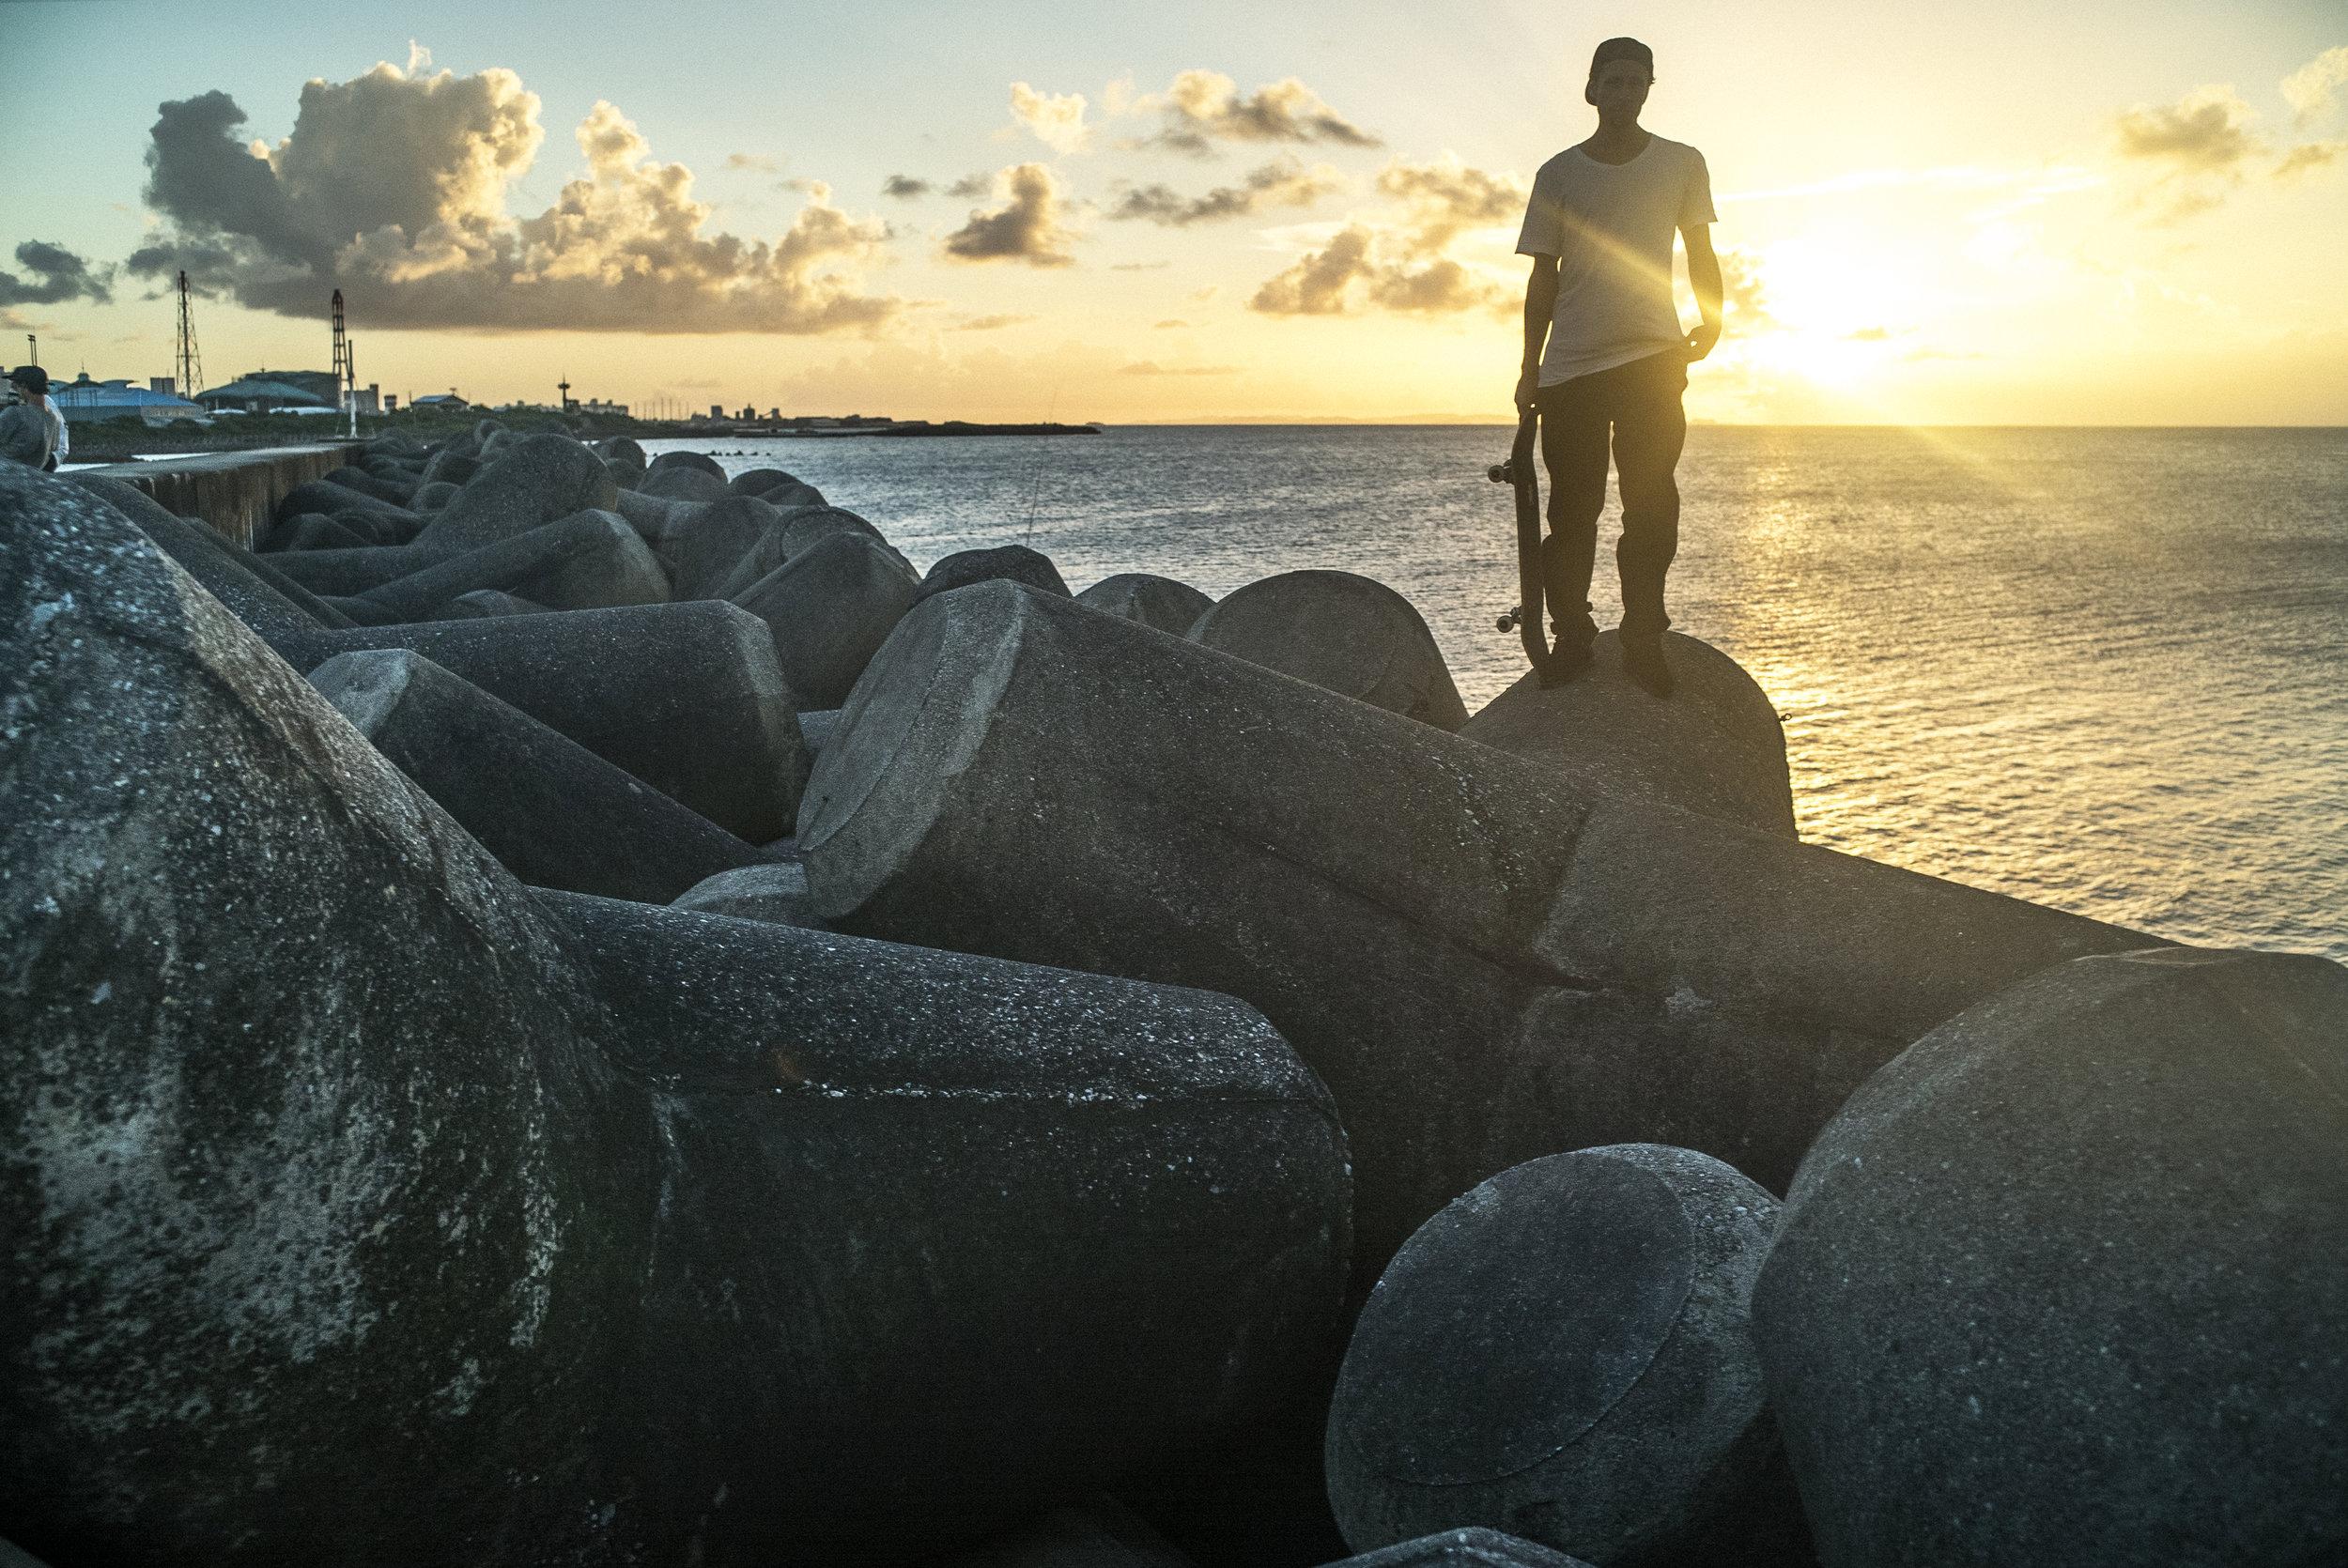 Digital Patrik Wallner 2016 Okinawa Walker Sunset.jpg